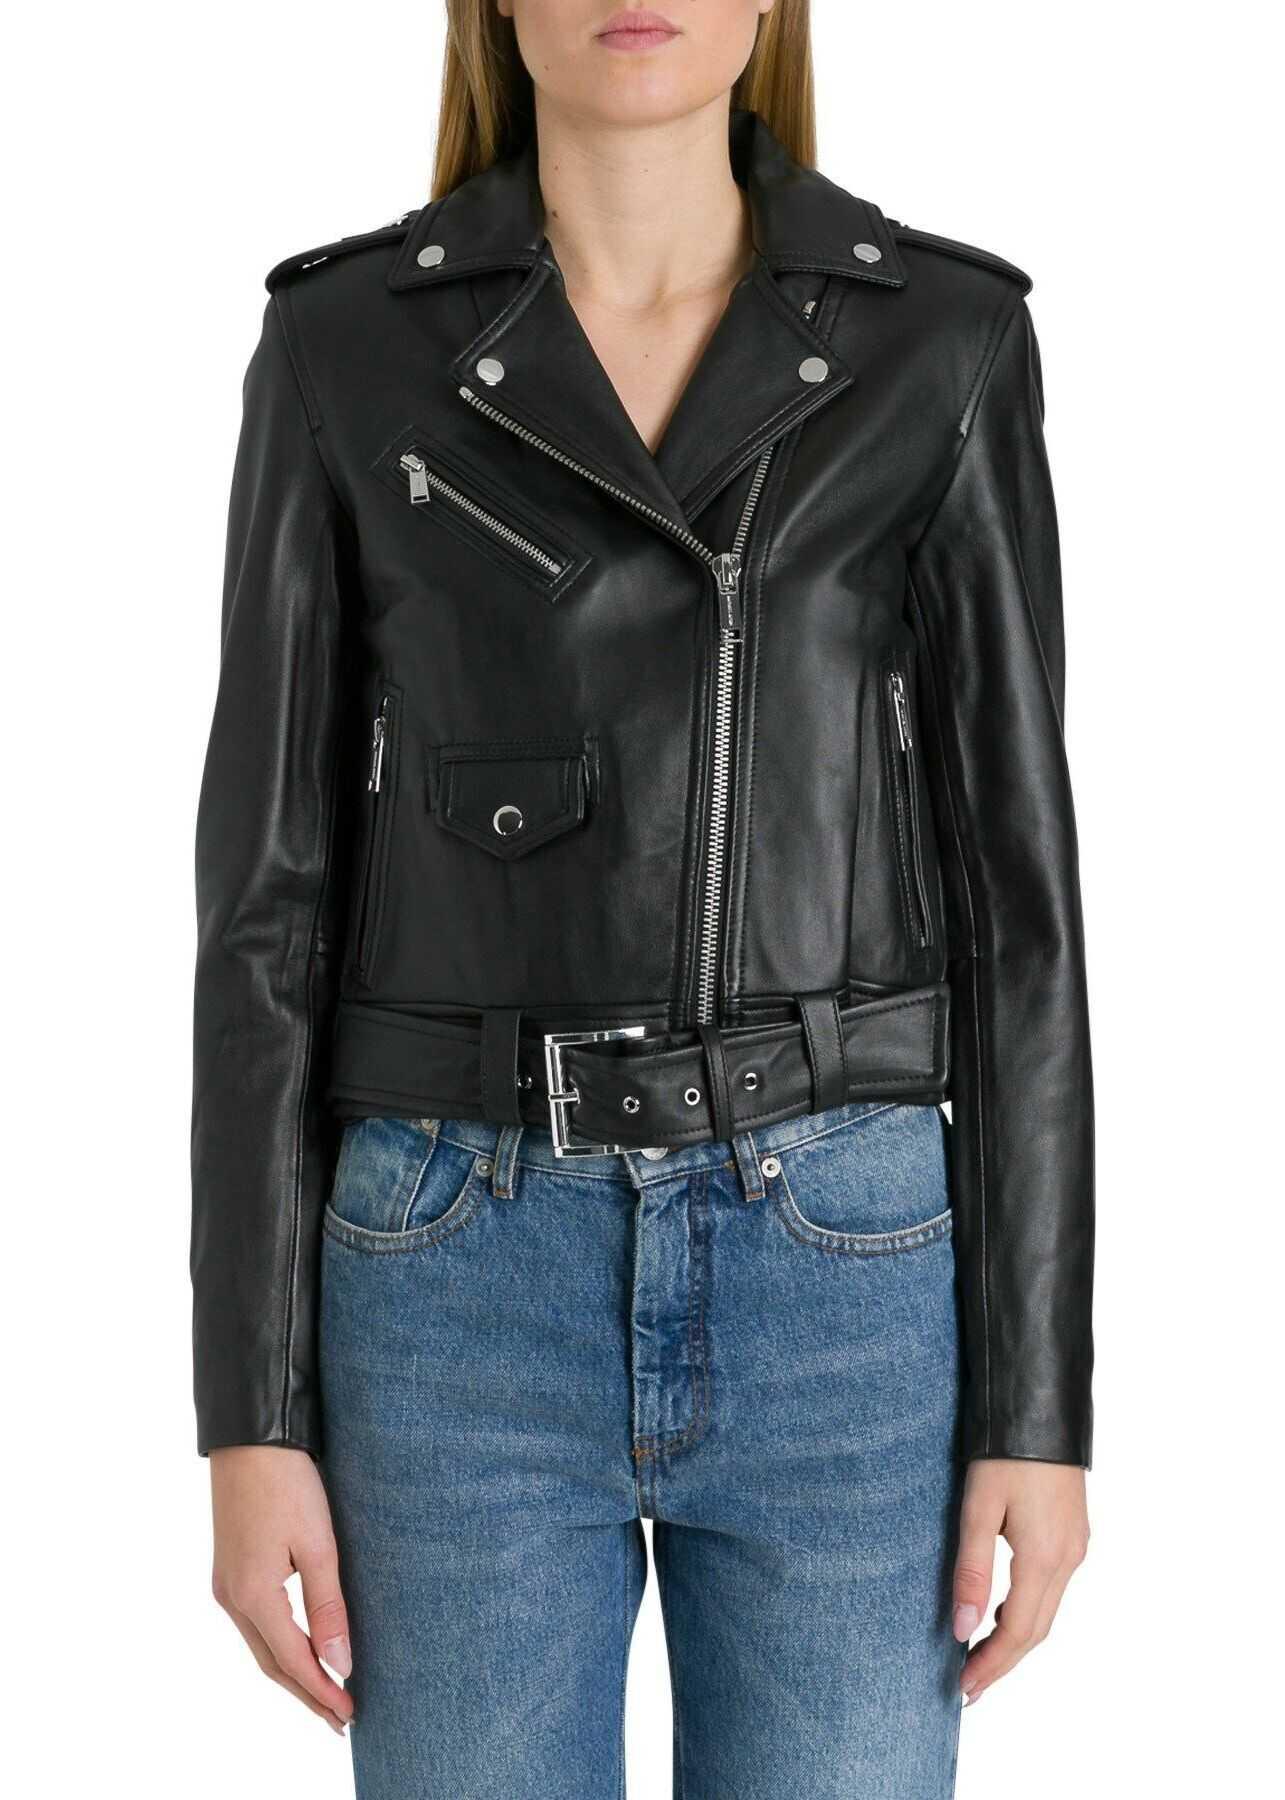 Michael Kors Leather Outerwear Jacket BLACK